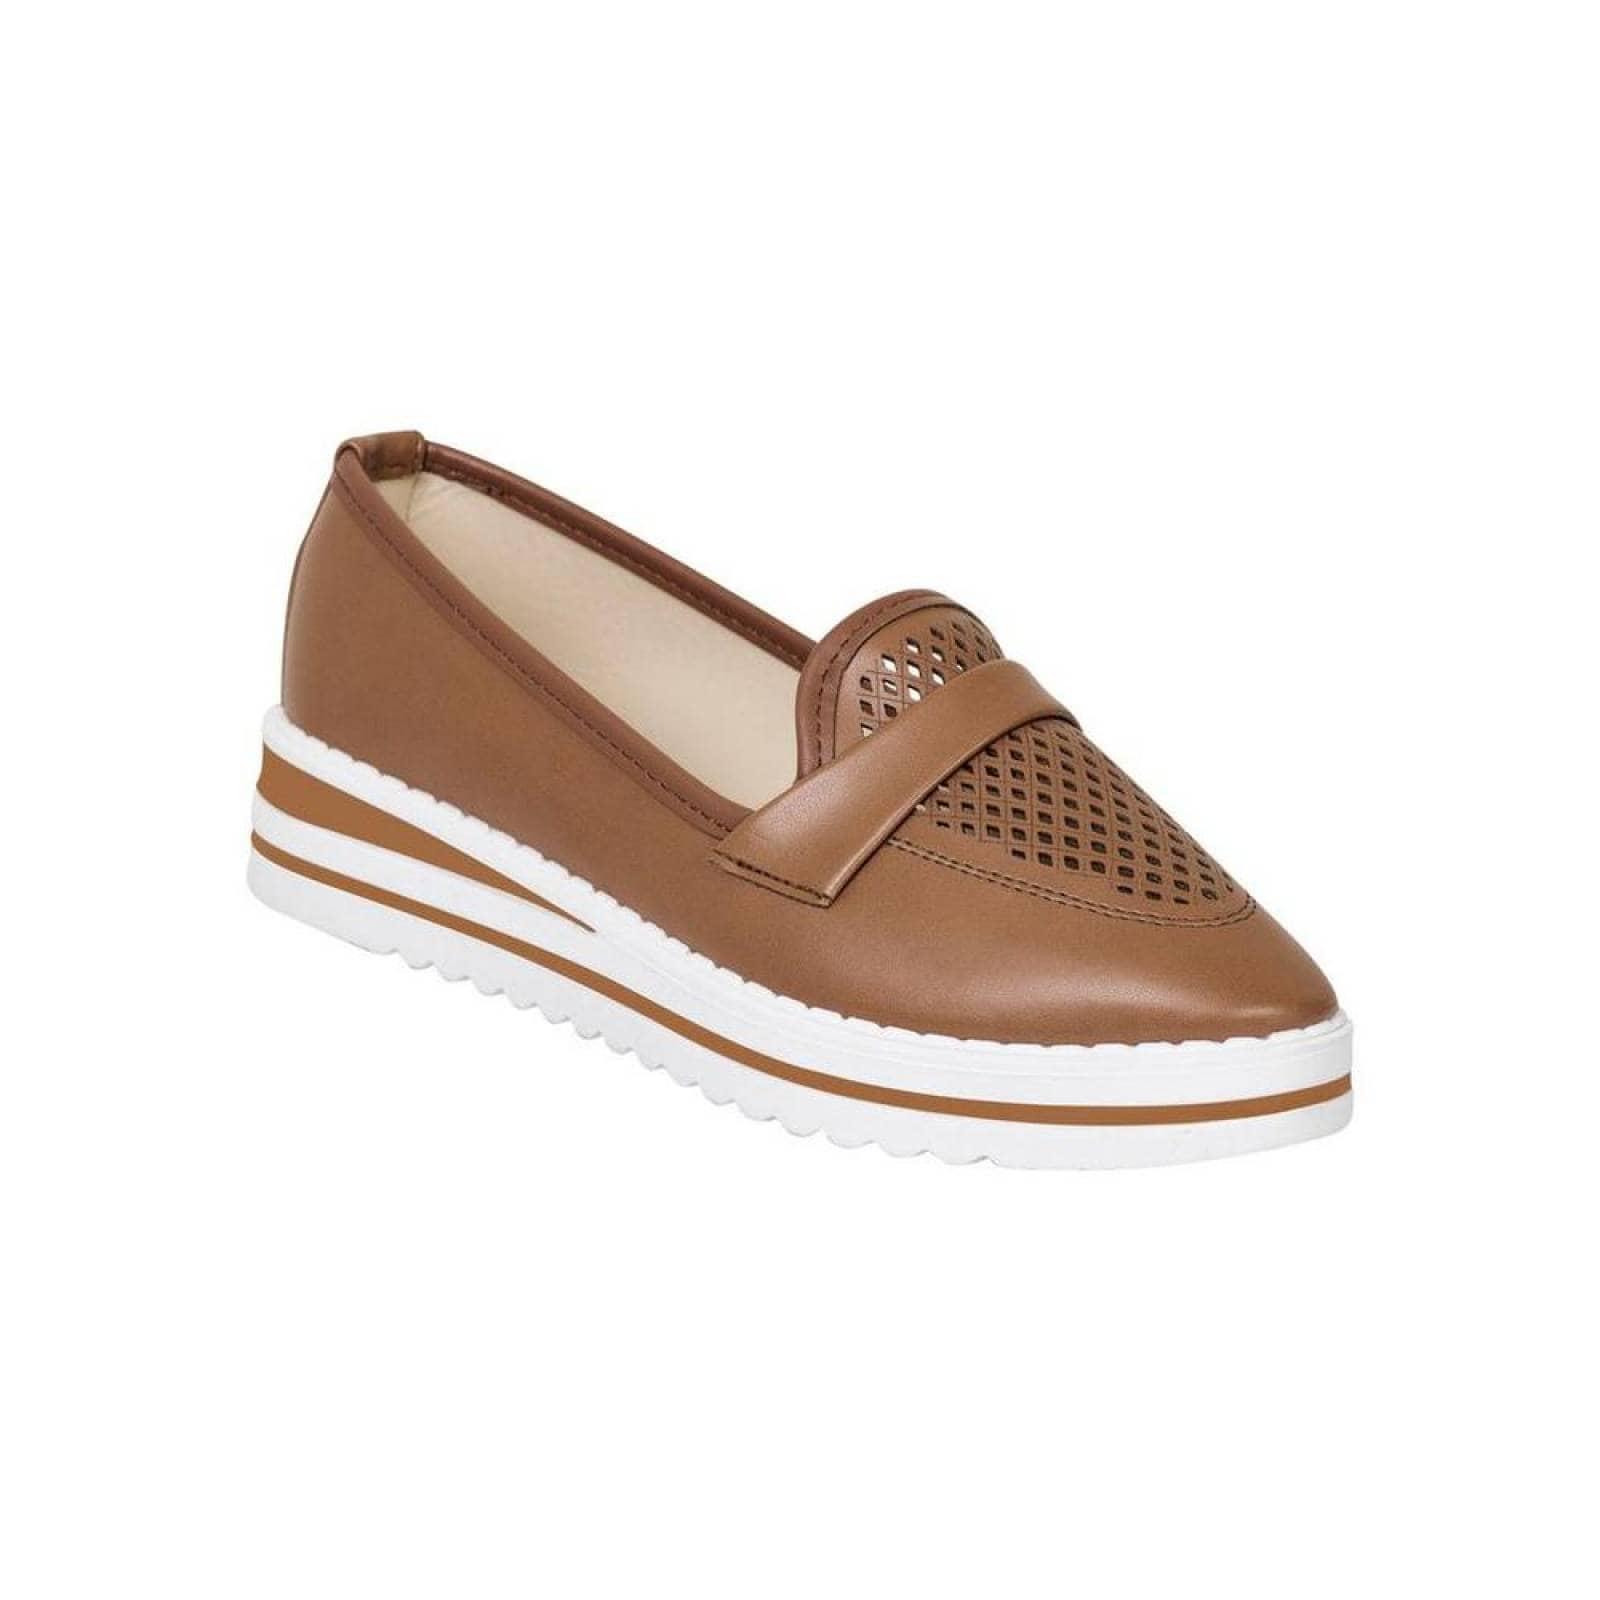 Zapato Cerrado Ivi Love Mujer Cafe Tipo Napa 4001